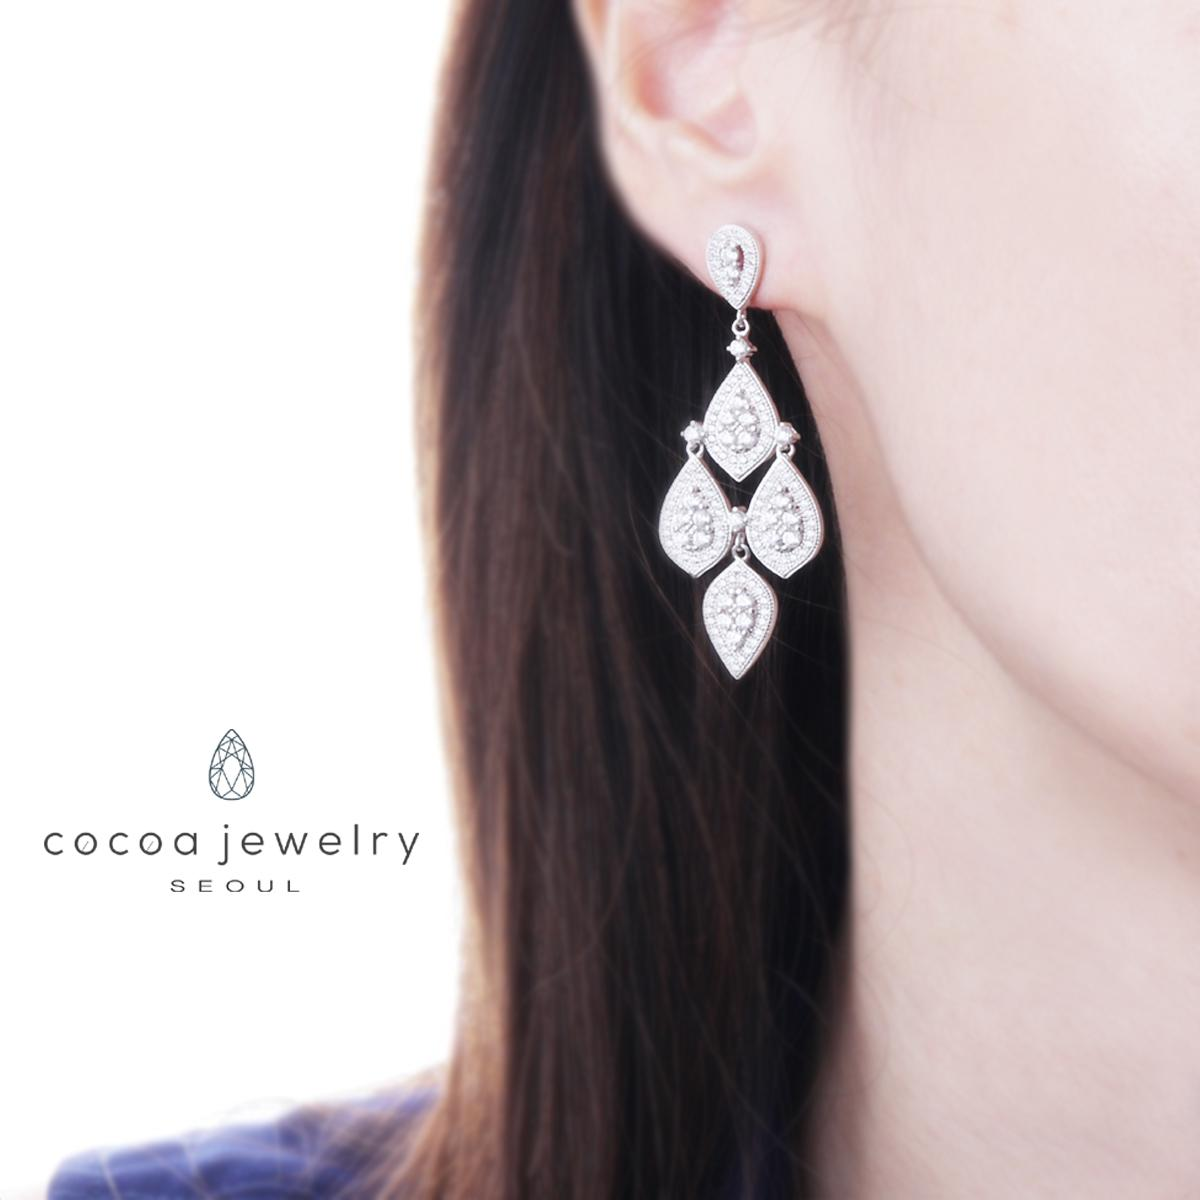 Kelebihan Cocoa Jewelry Love Rain Earring Terkini Daftar Harga Dan The Special Gift Anting Elegant 4